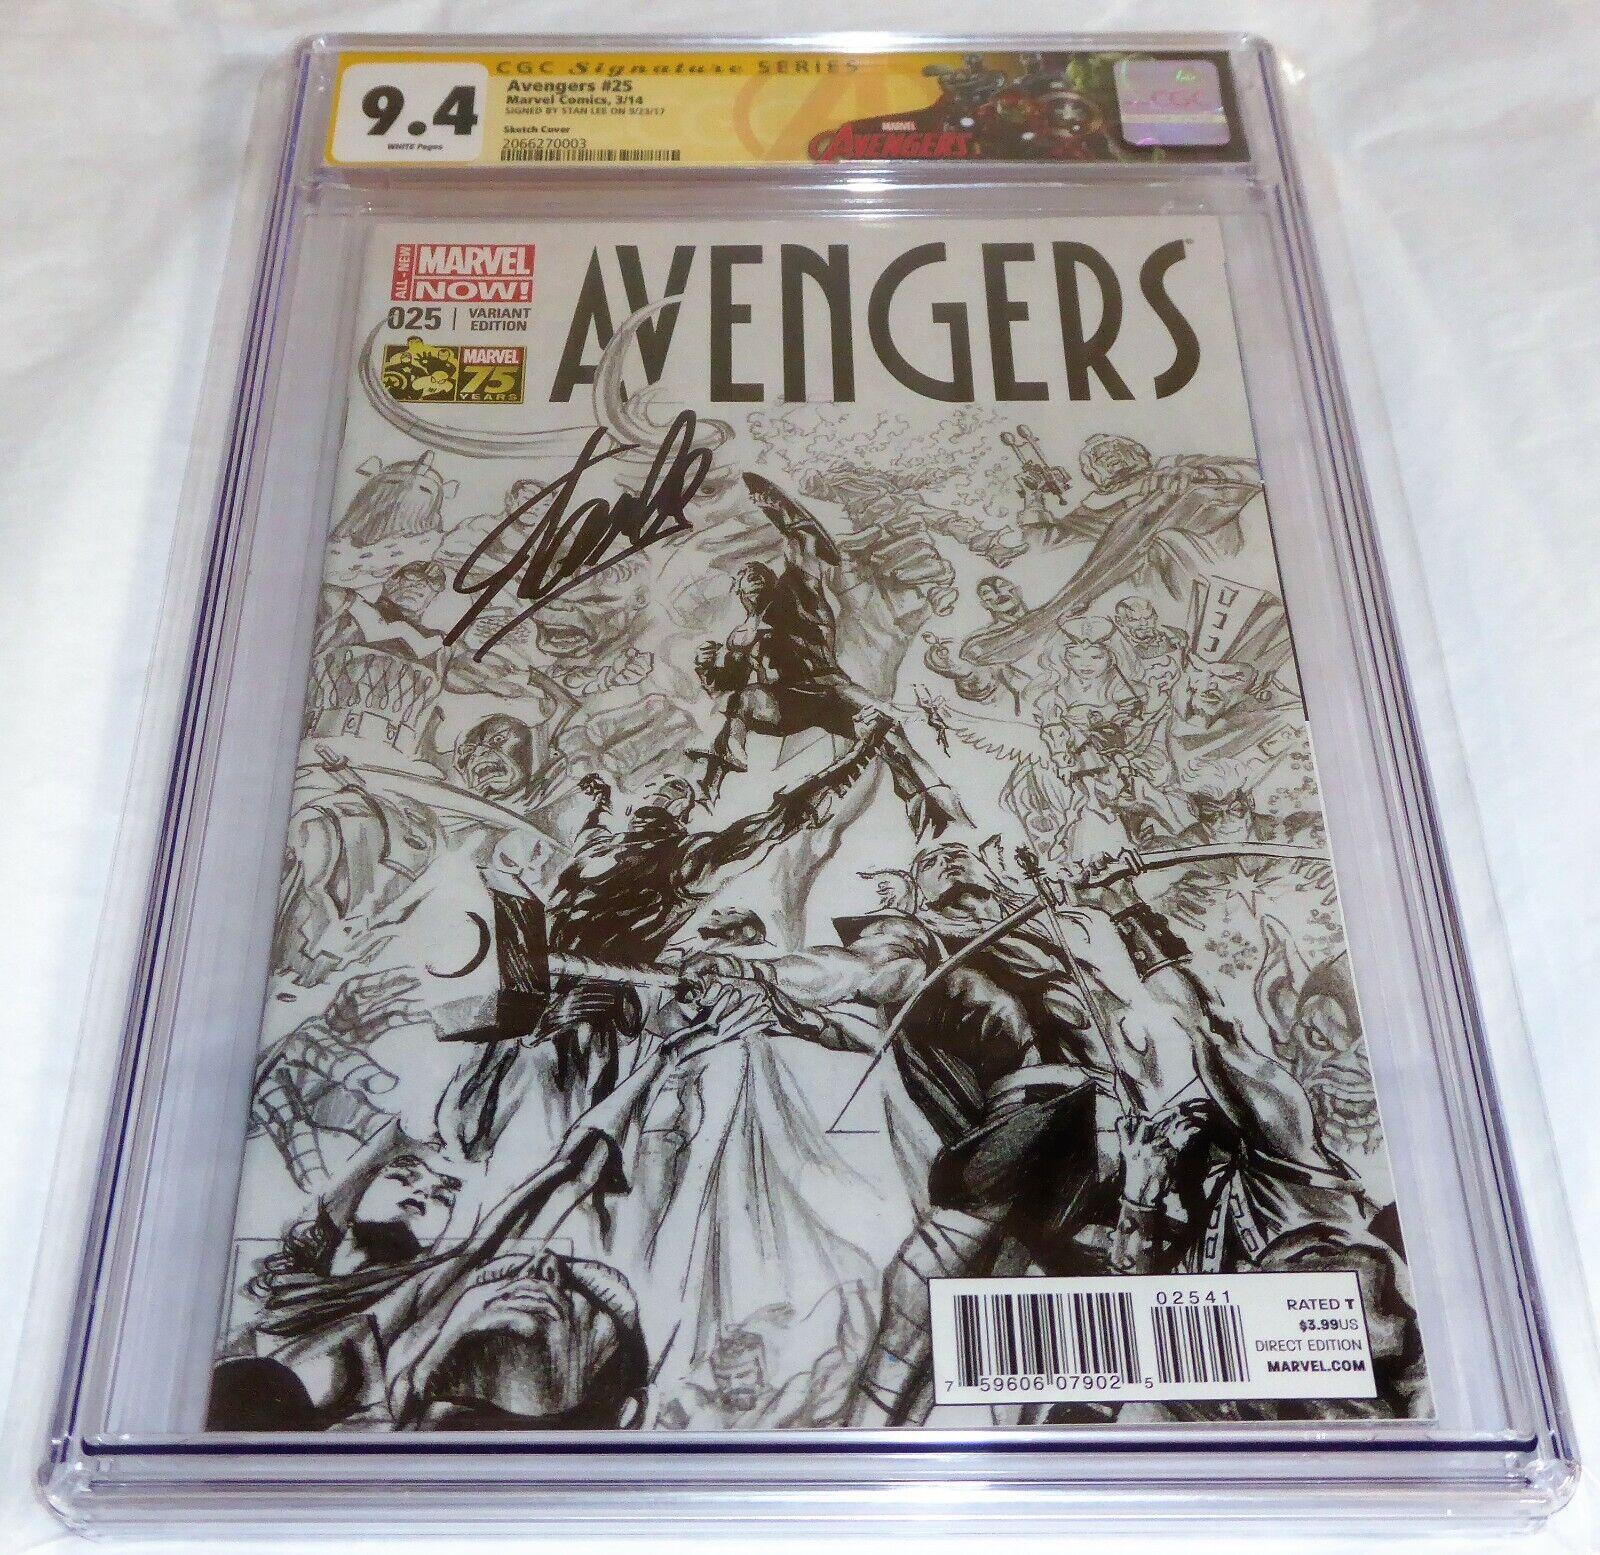 Avengers #25 1:200 CGC SS Signature Autograph STAN LEE Sketch Cover Variant MCU